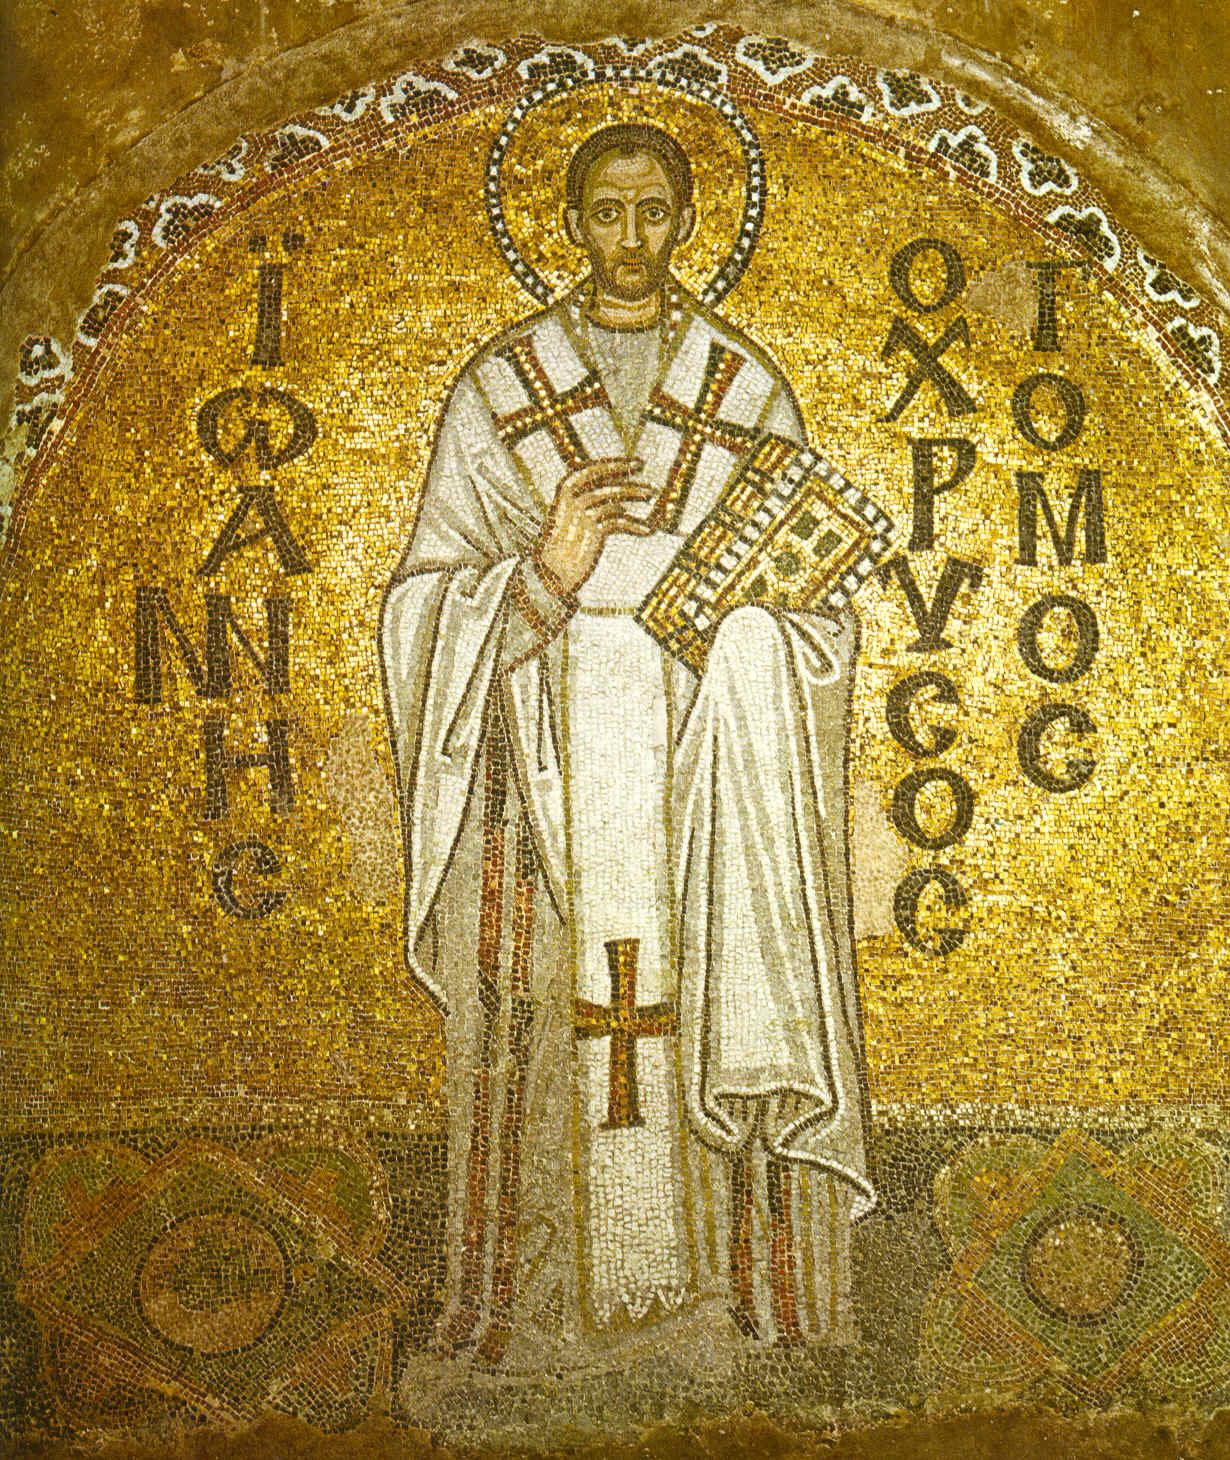 Bysantinsk mosaikk av Johannes Krysostomos fra Hagia Sofia i Istanbul